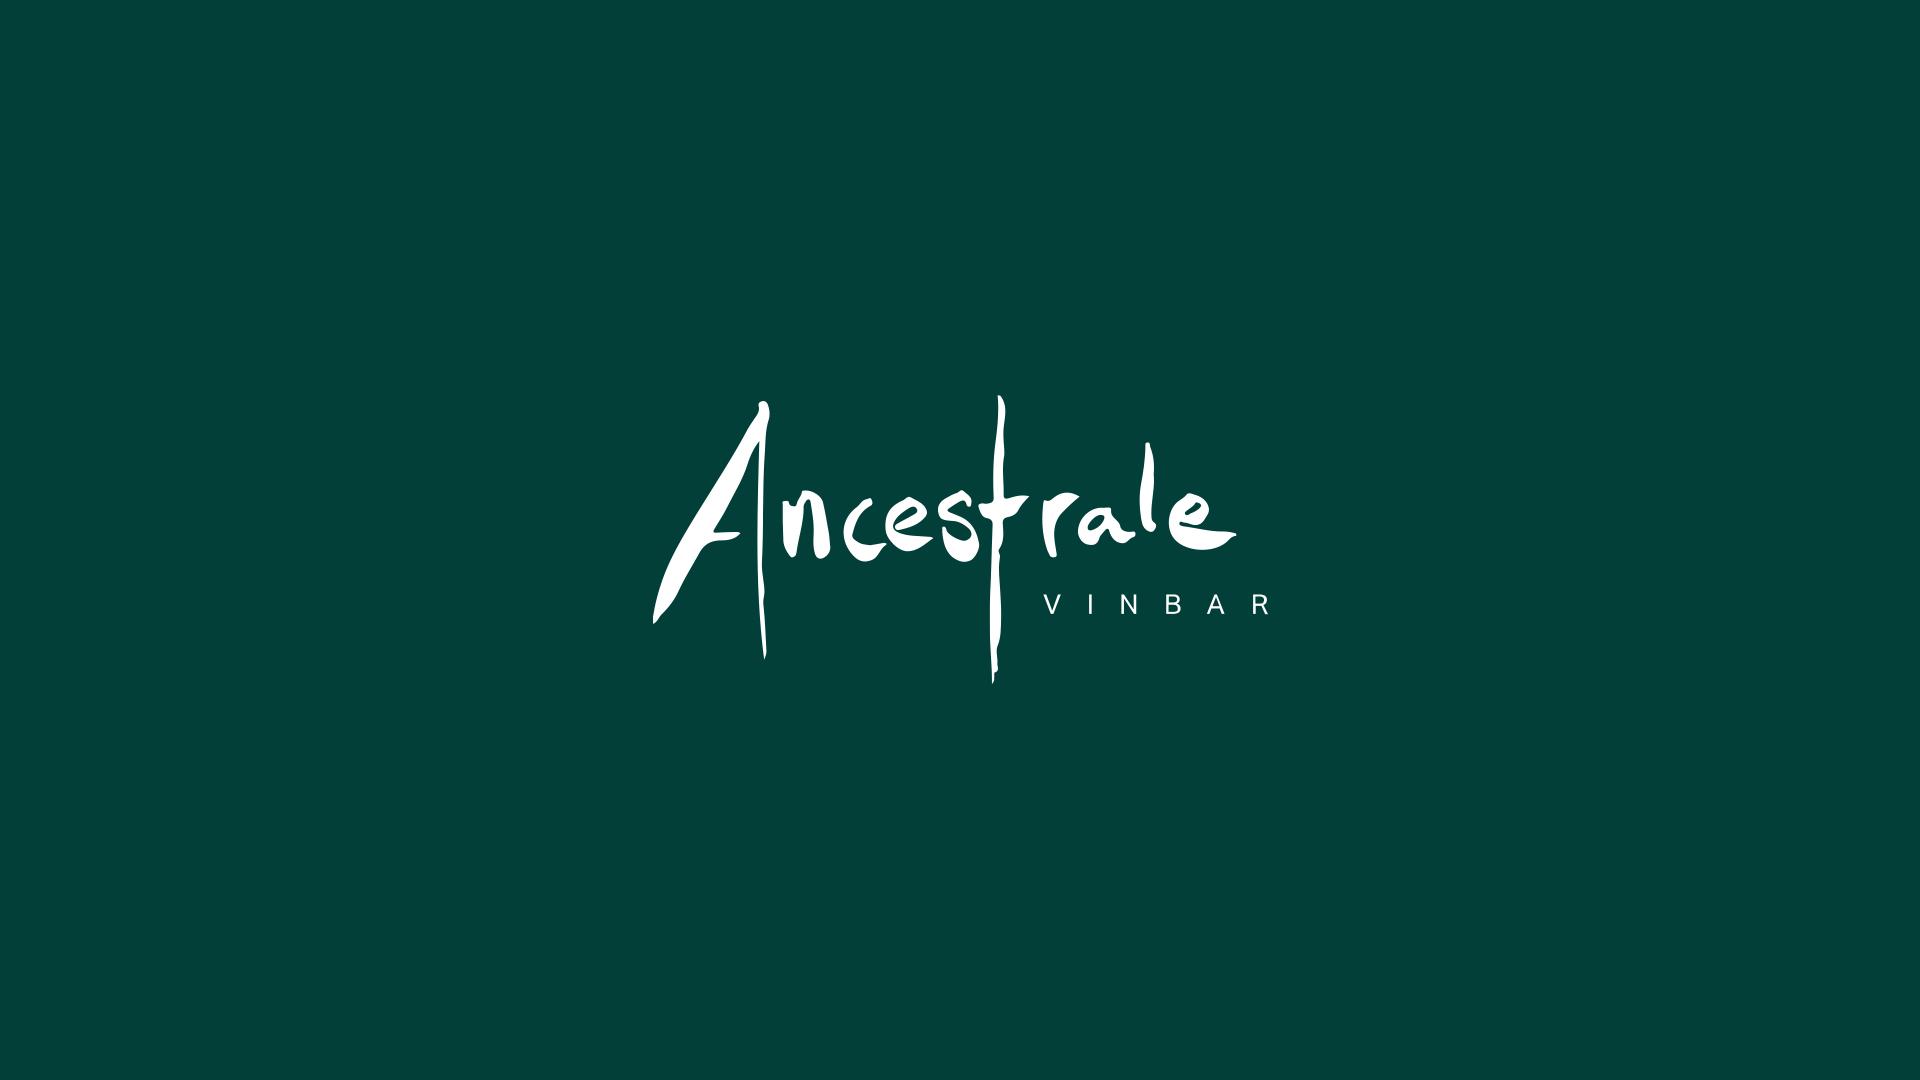 ancestrale_04